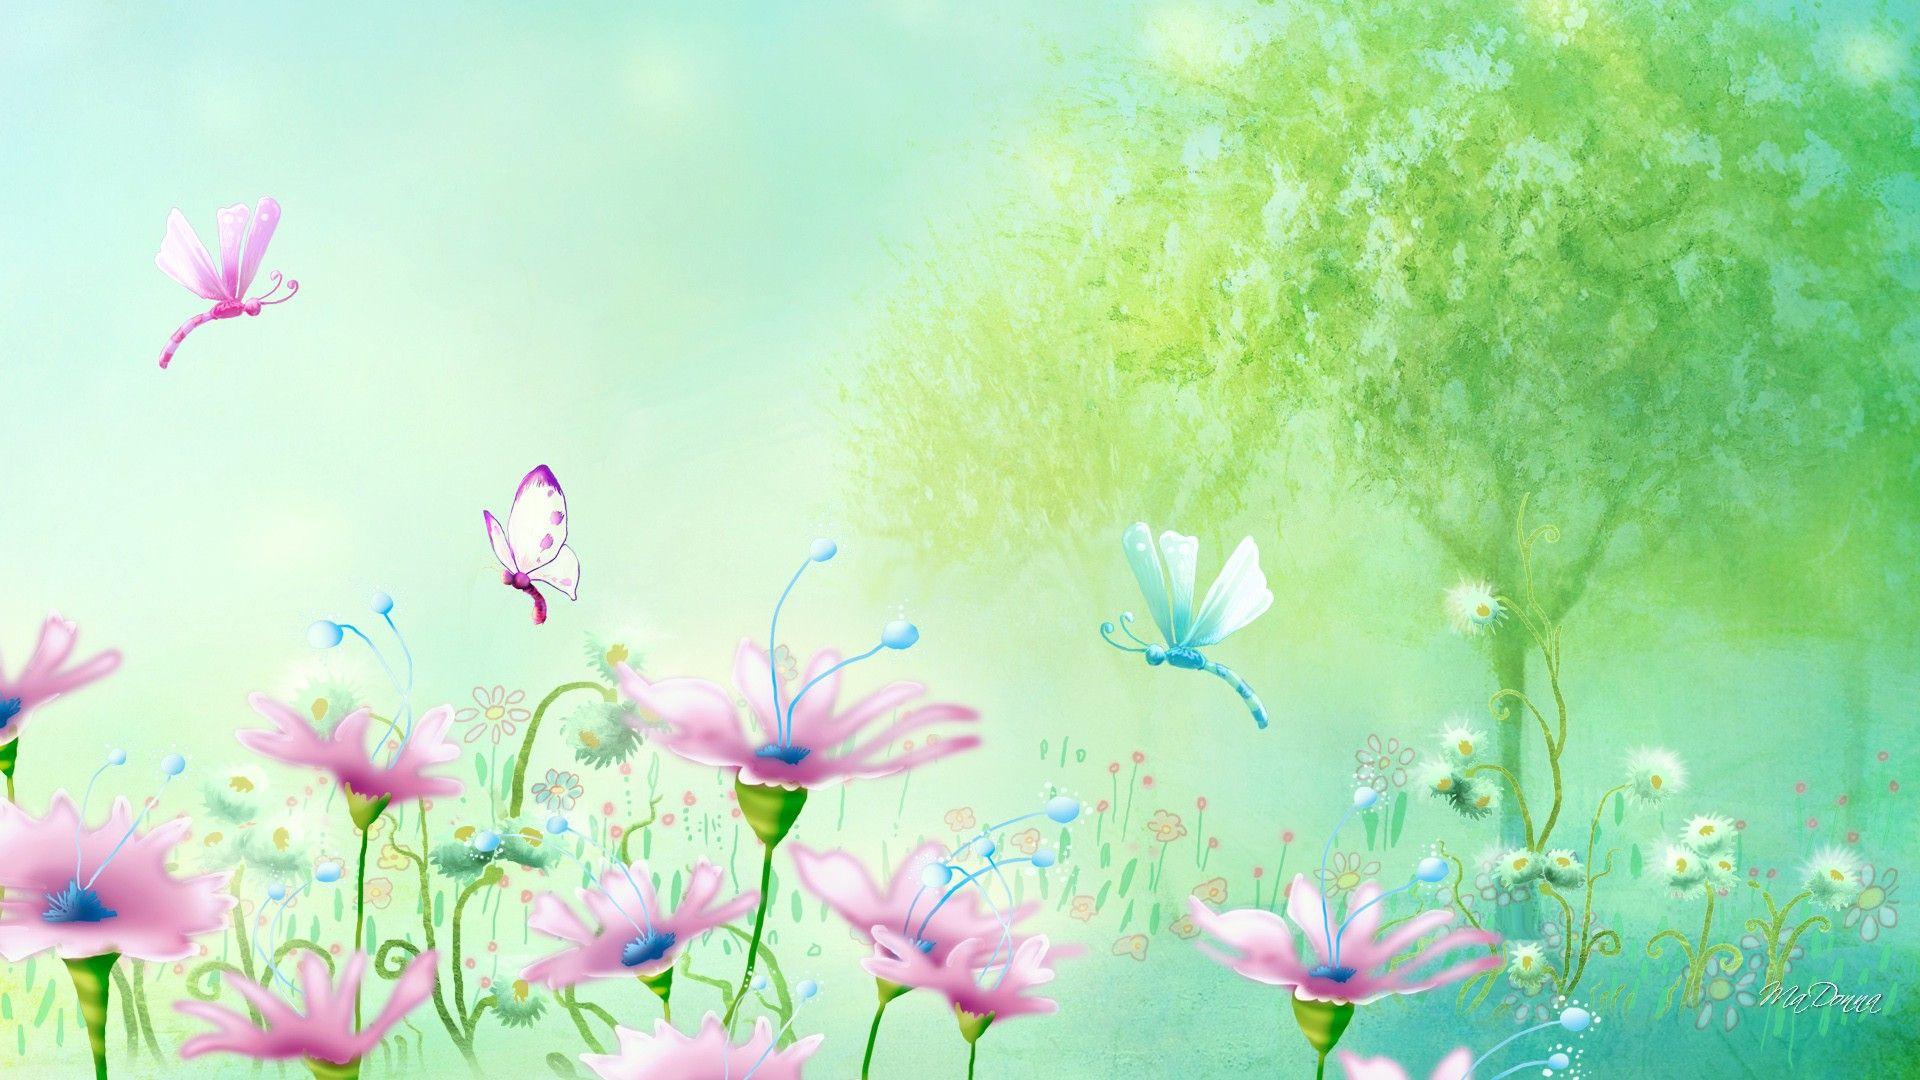 Springtime Backgrounds Desktop - WallpaperSafari